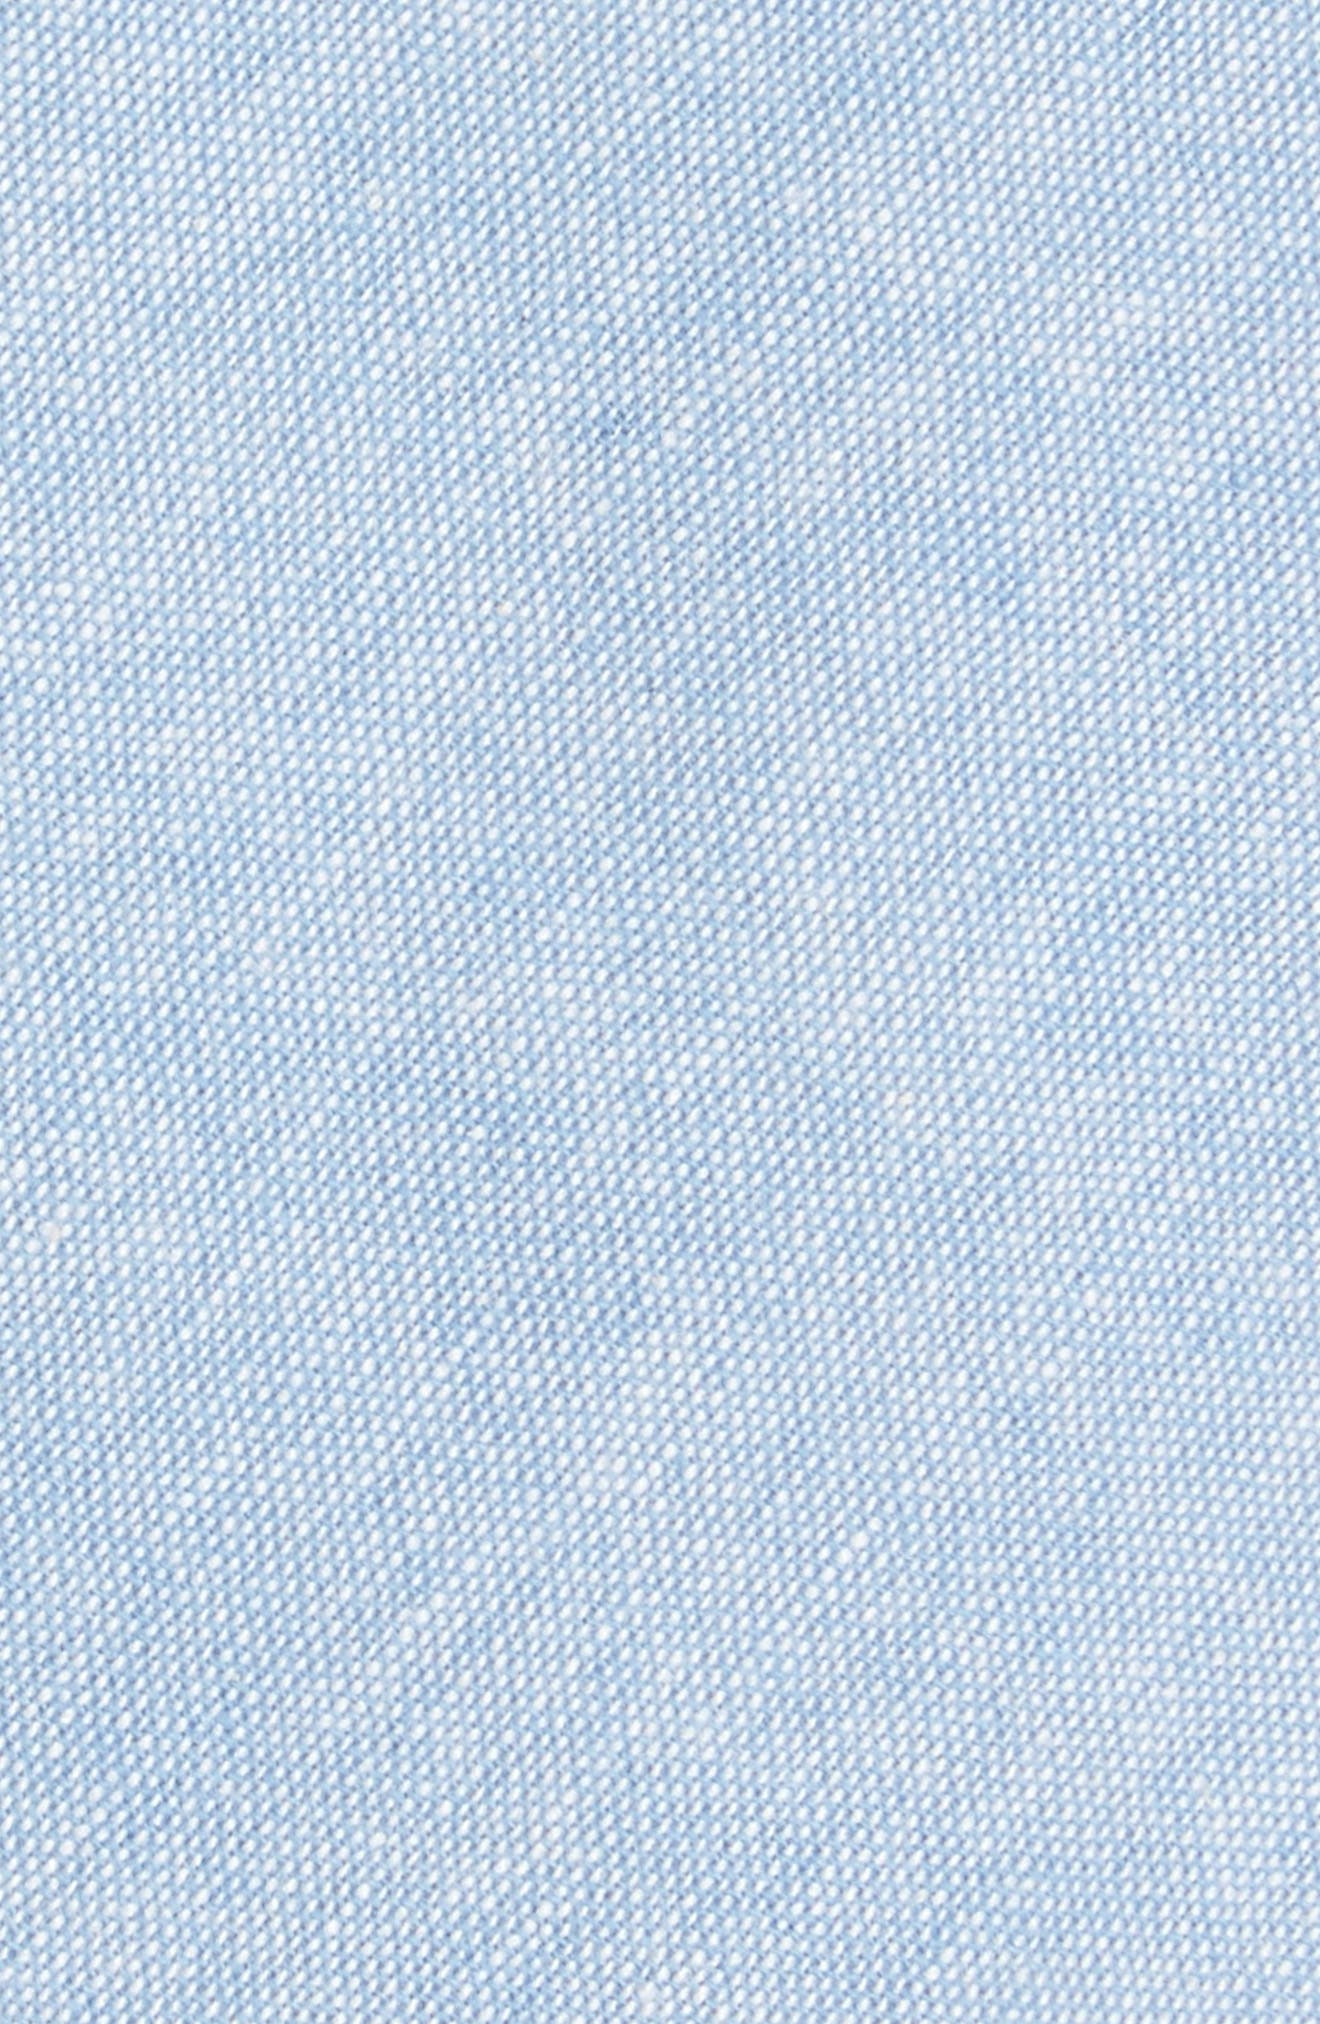 Laguna Solid Cotton Skinny Tie,                             Alternate thumbnail 2, color,                             Blue